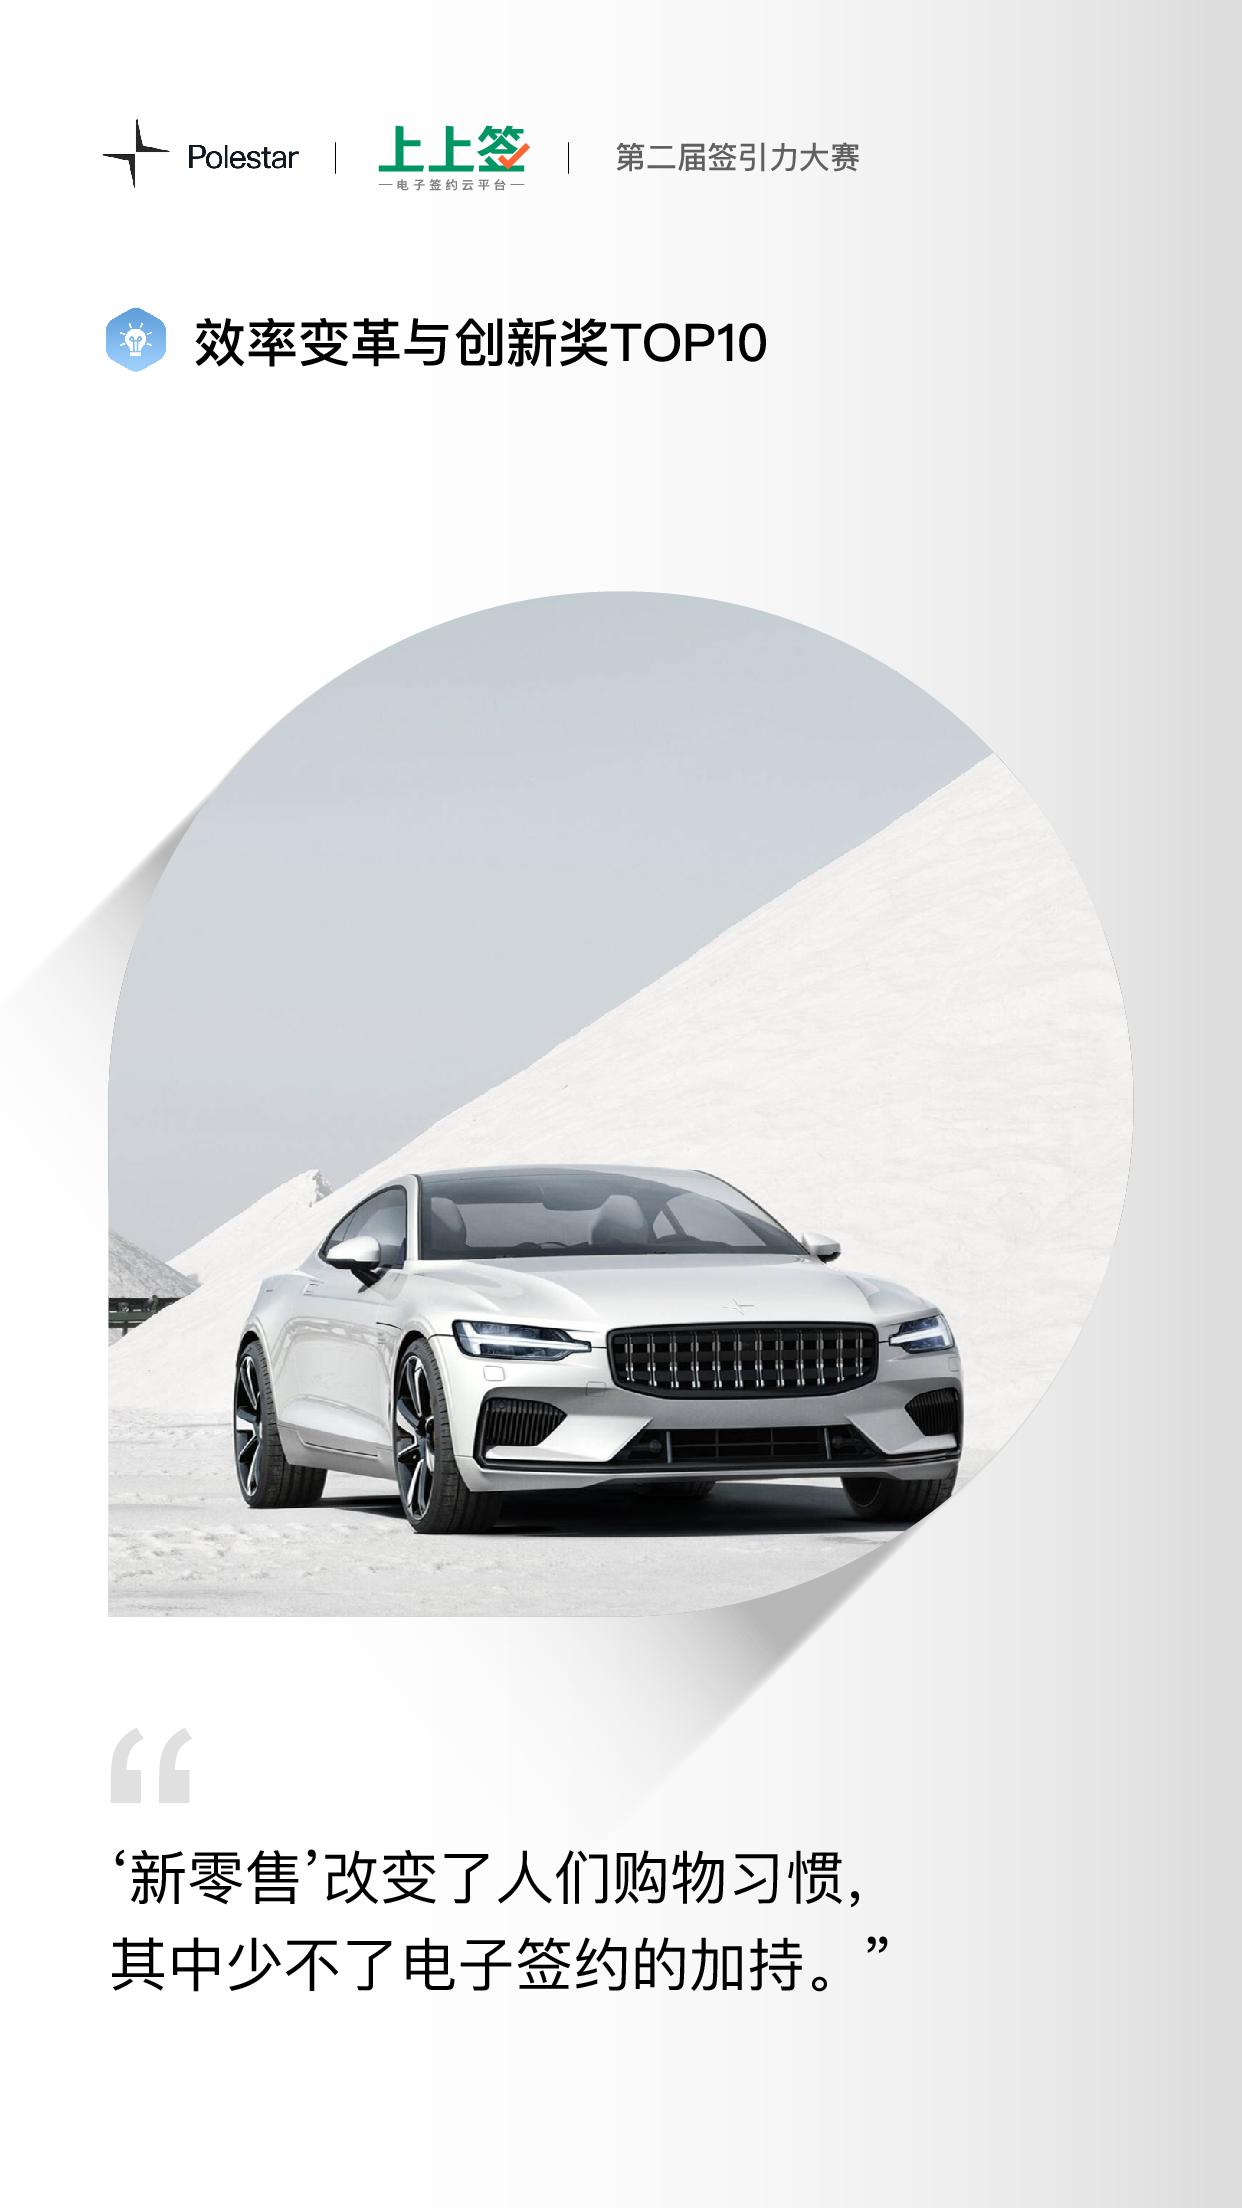 Polestar极星携手上上签电子签约构建汽车新零售